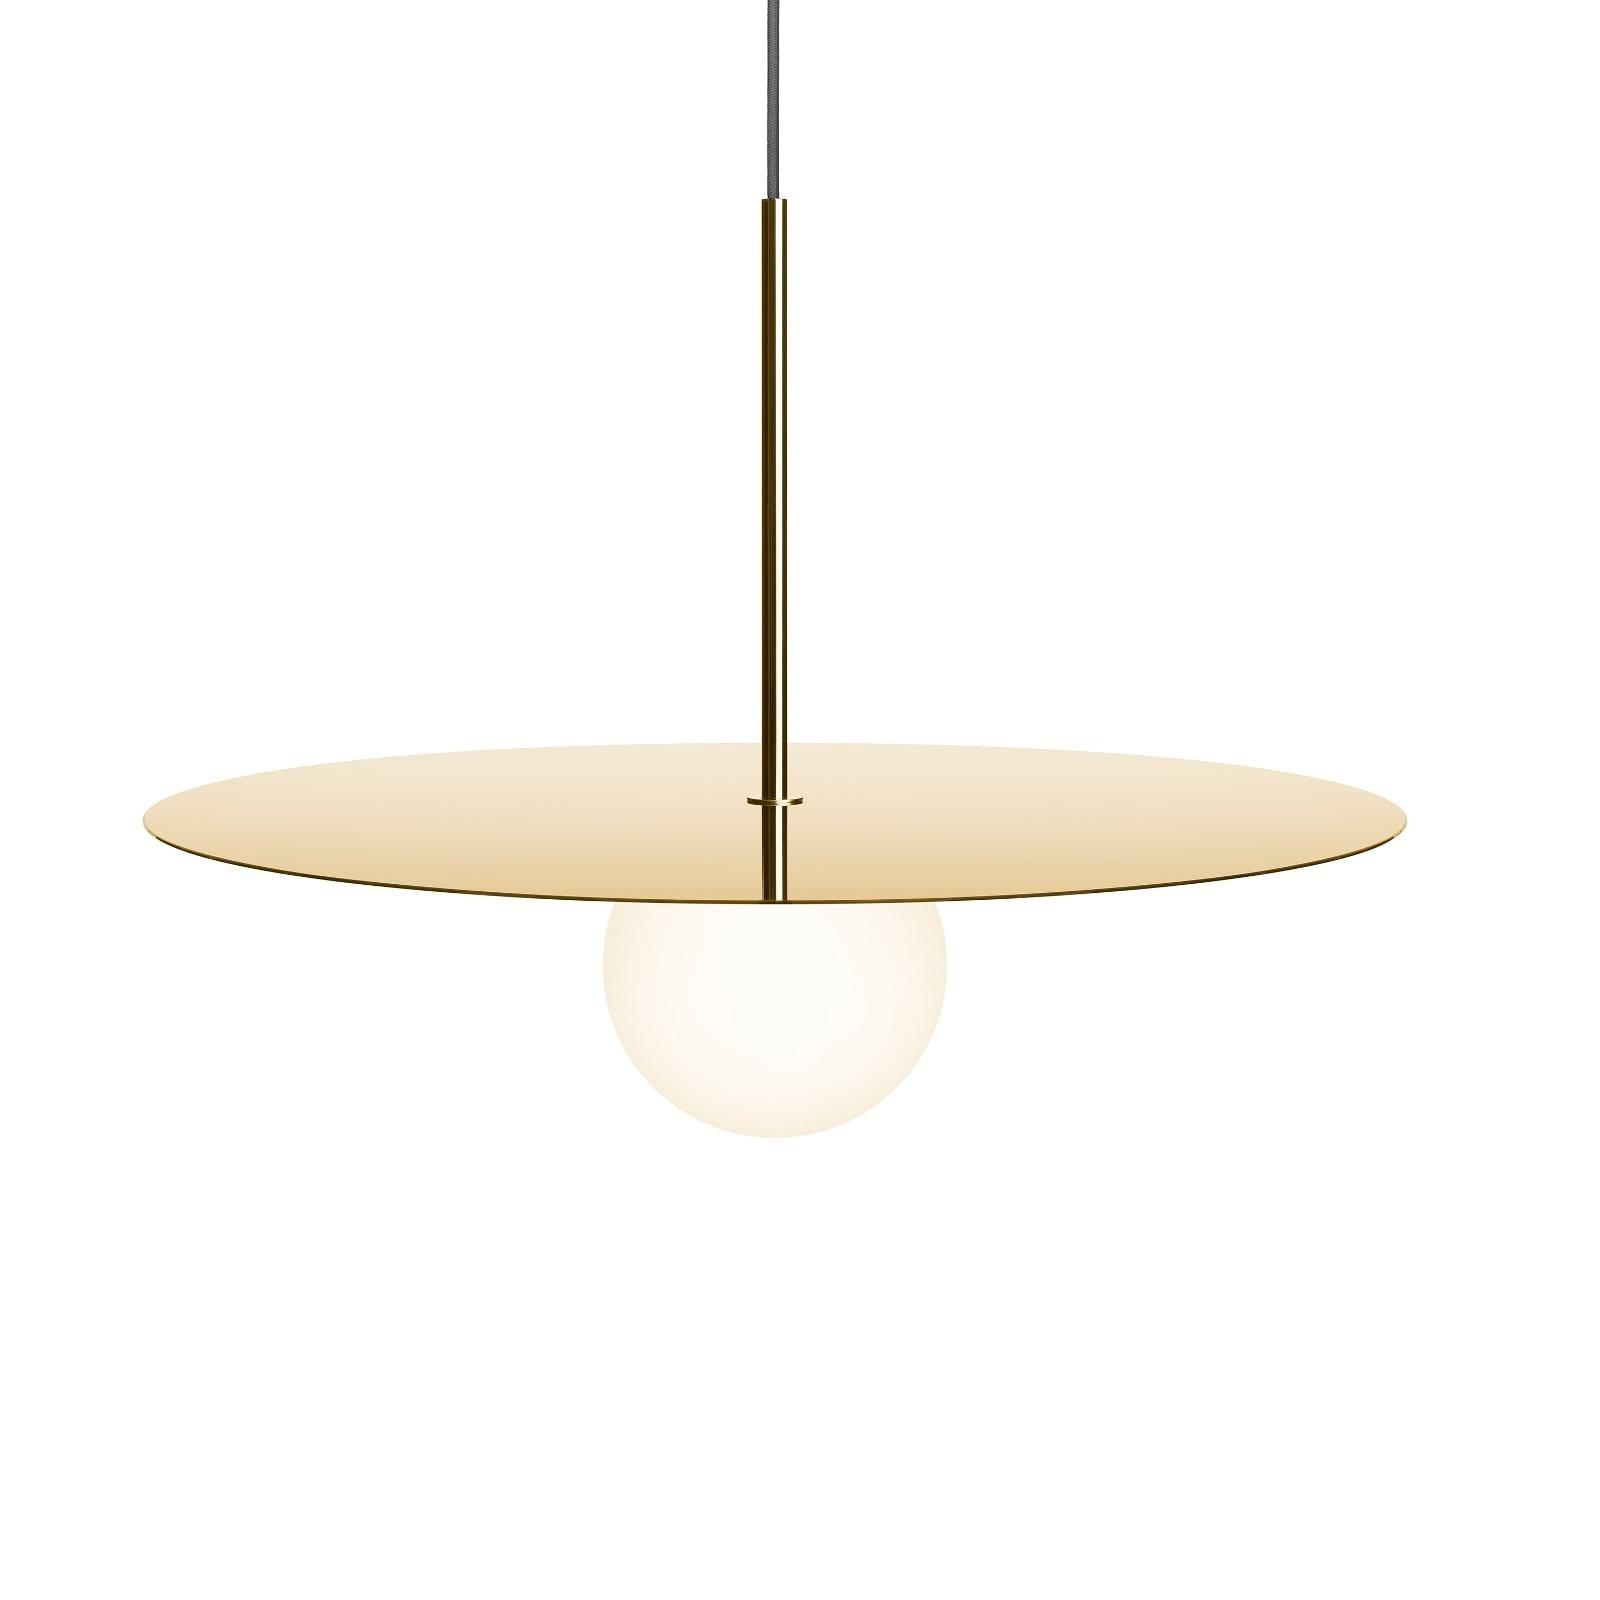 LED Φωτιστικό Οροφής Bola Disc (Μπρούτζος) - Pablo Designs